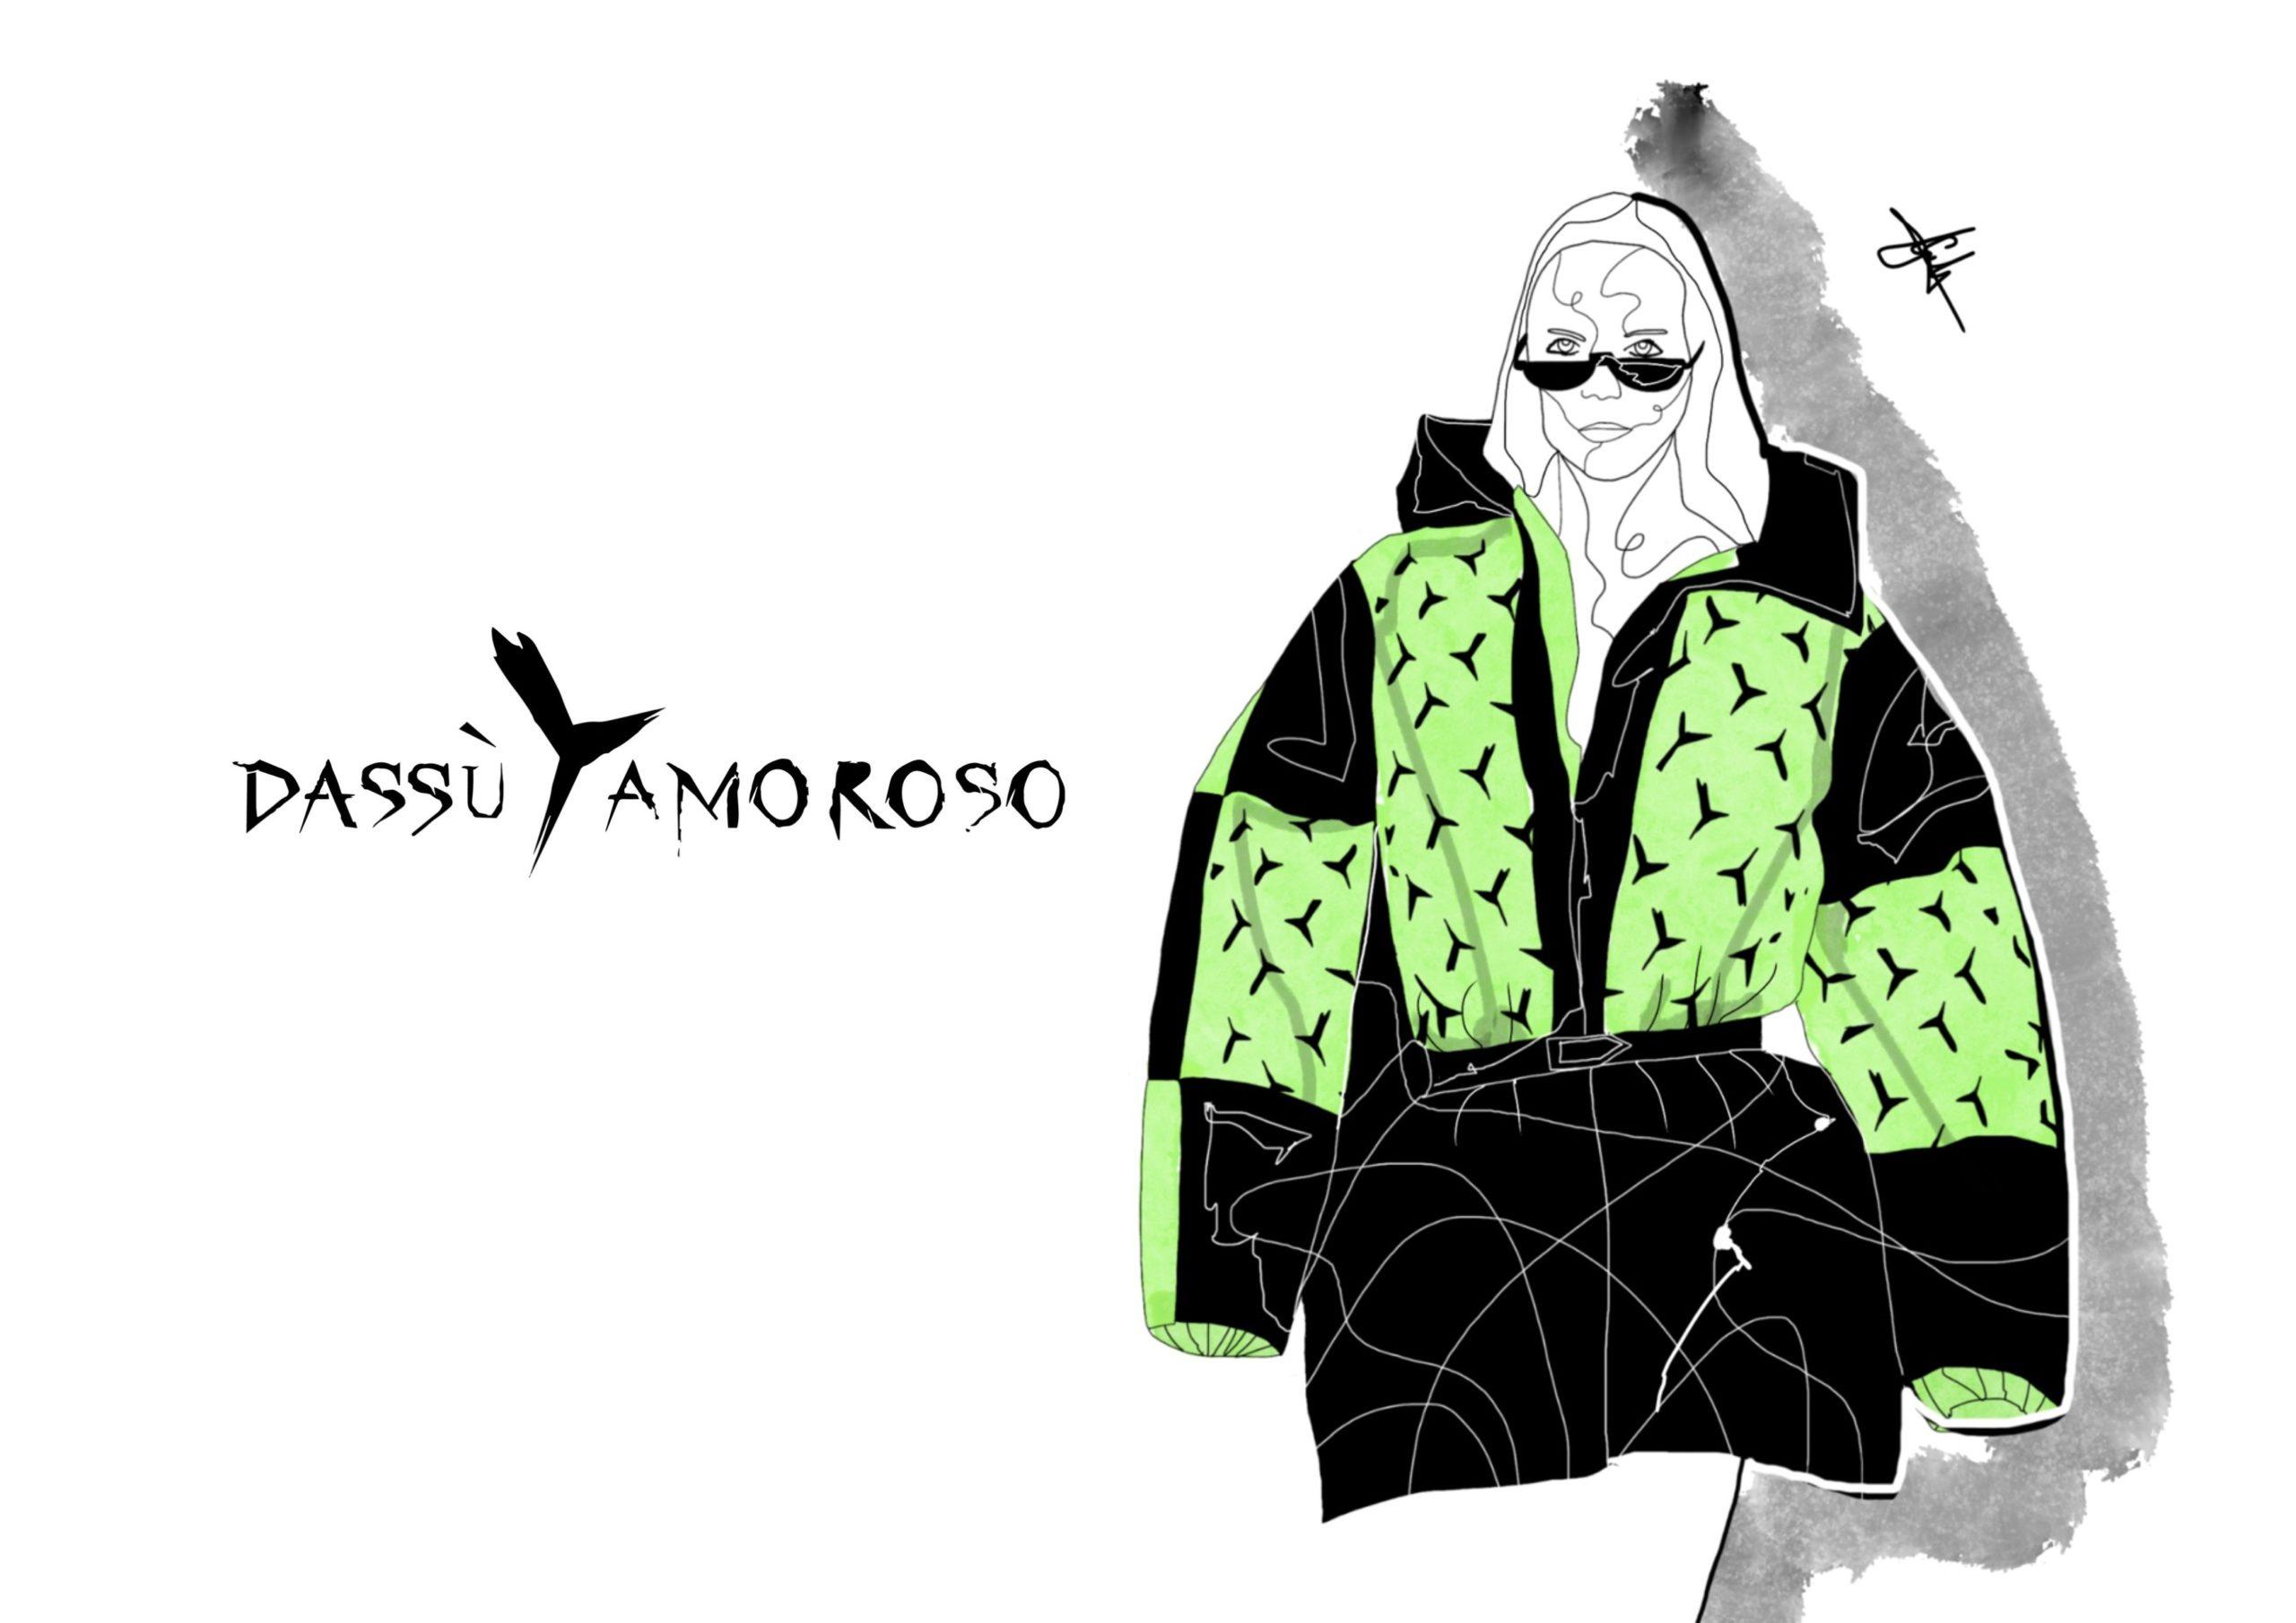 DassùYAmoroso No Gender illustrated by Gabriele Melodia